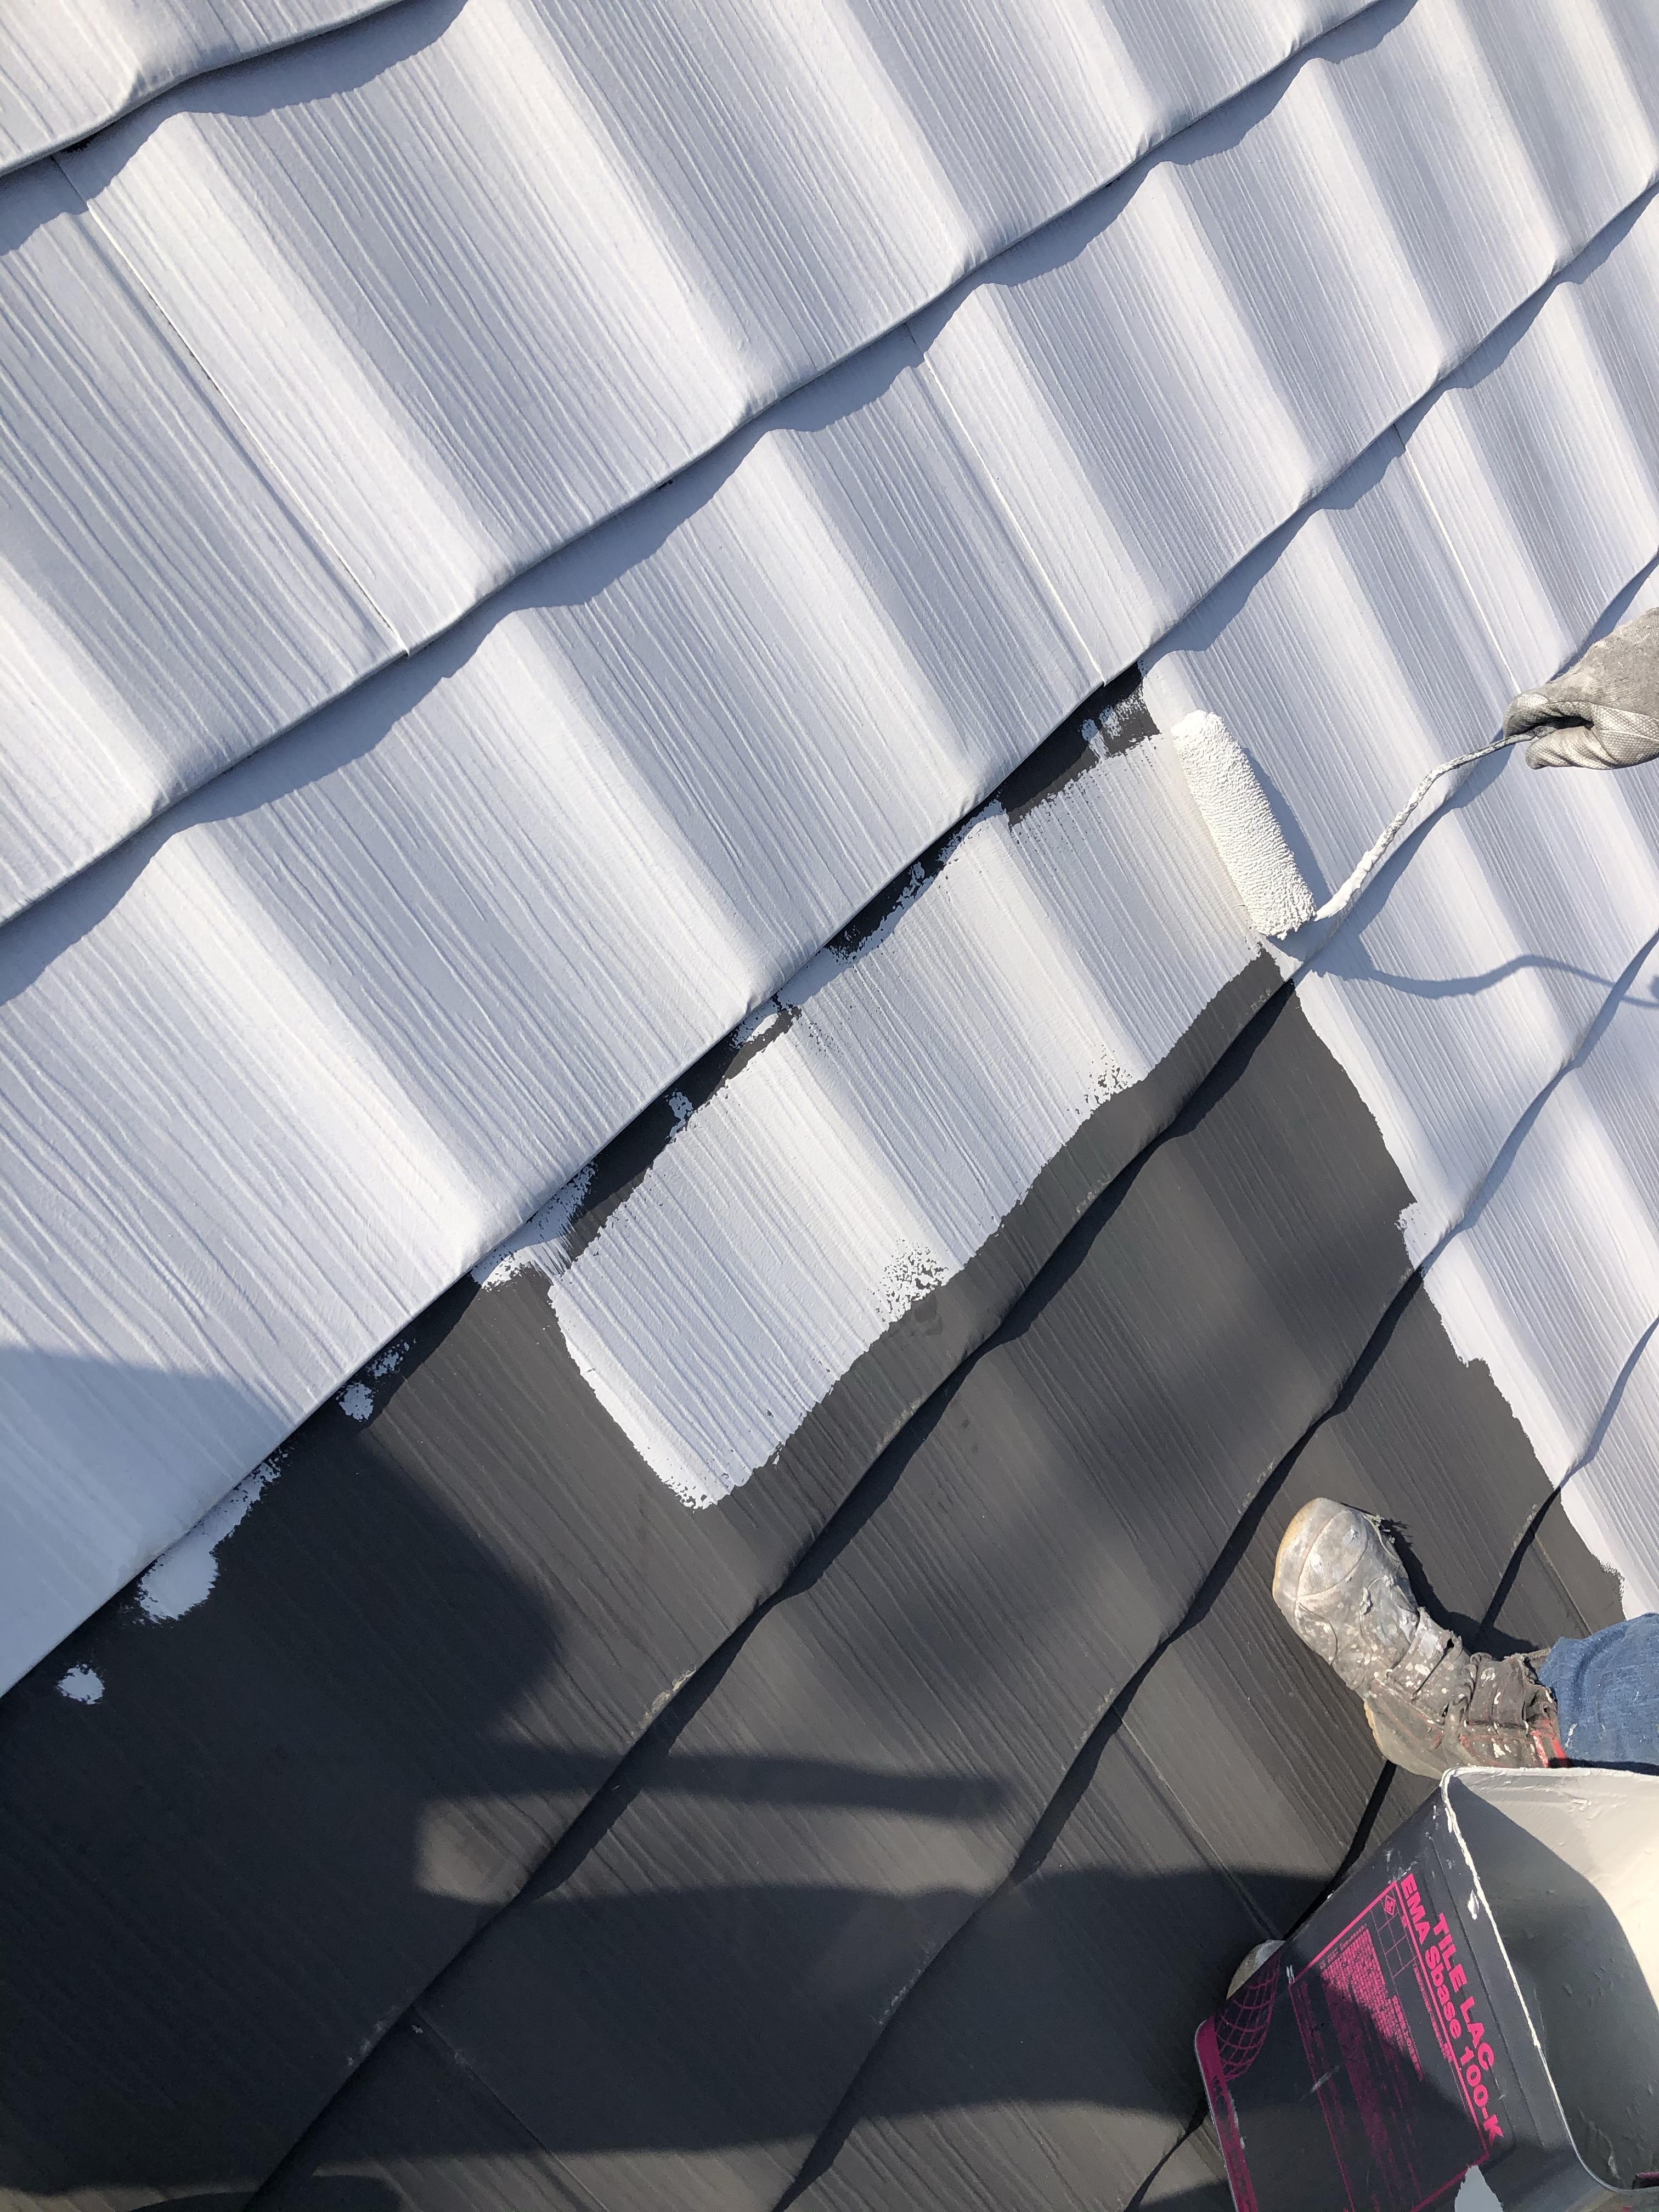 高槻市で屋根、外壁塗装